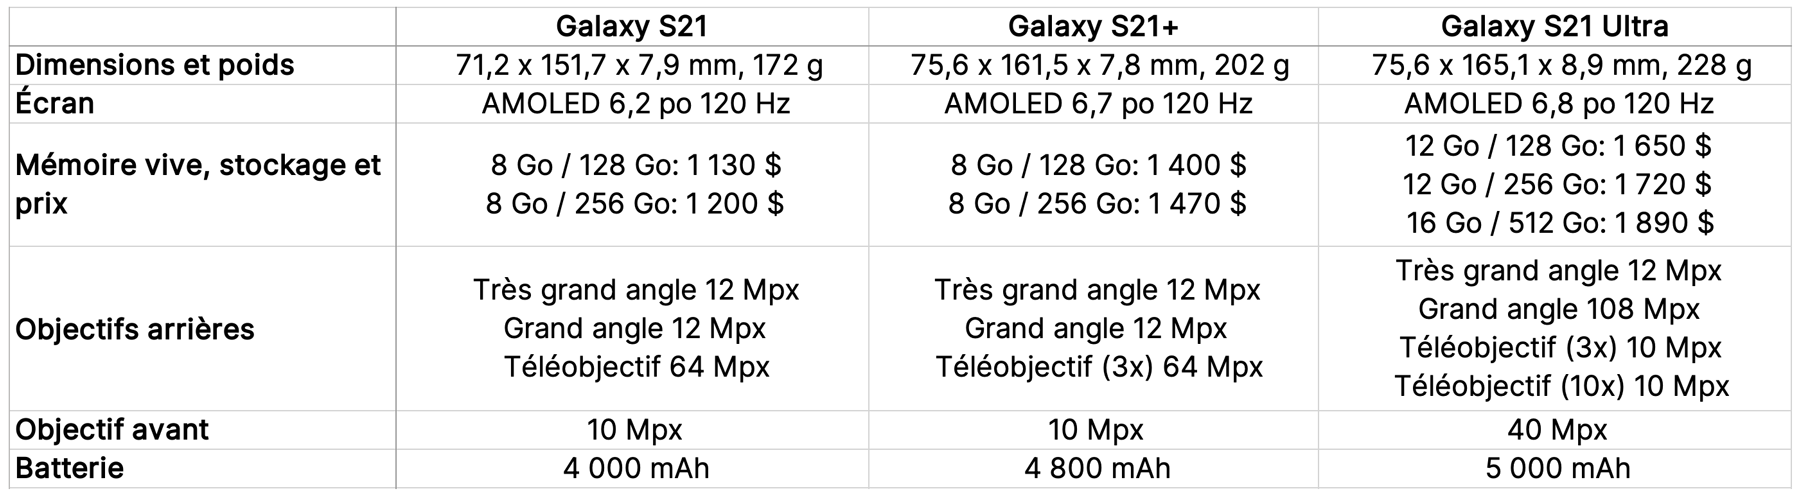 tableau-galaxys21-series